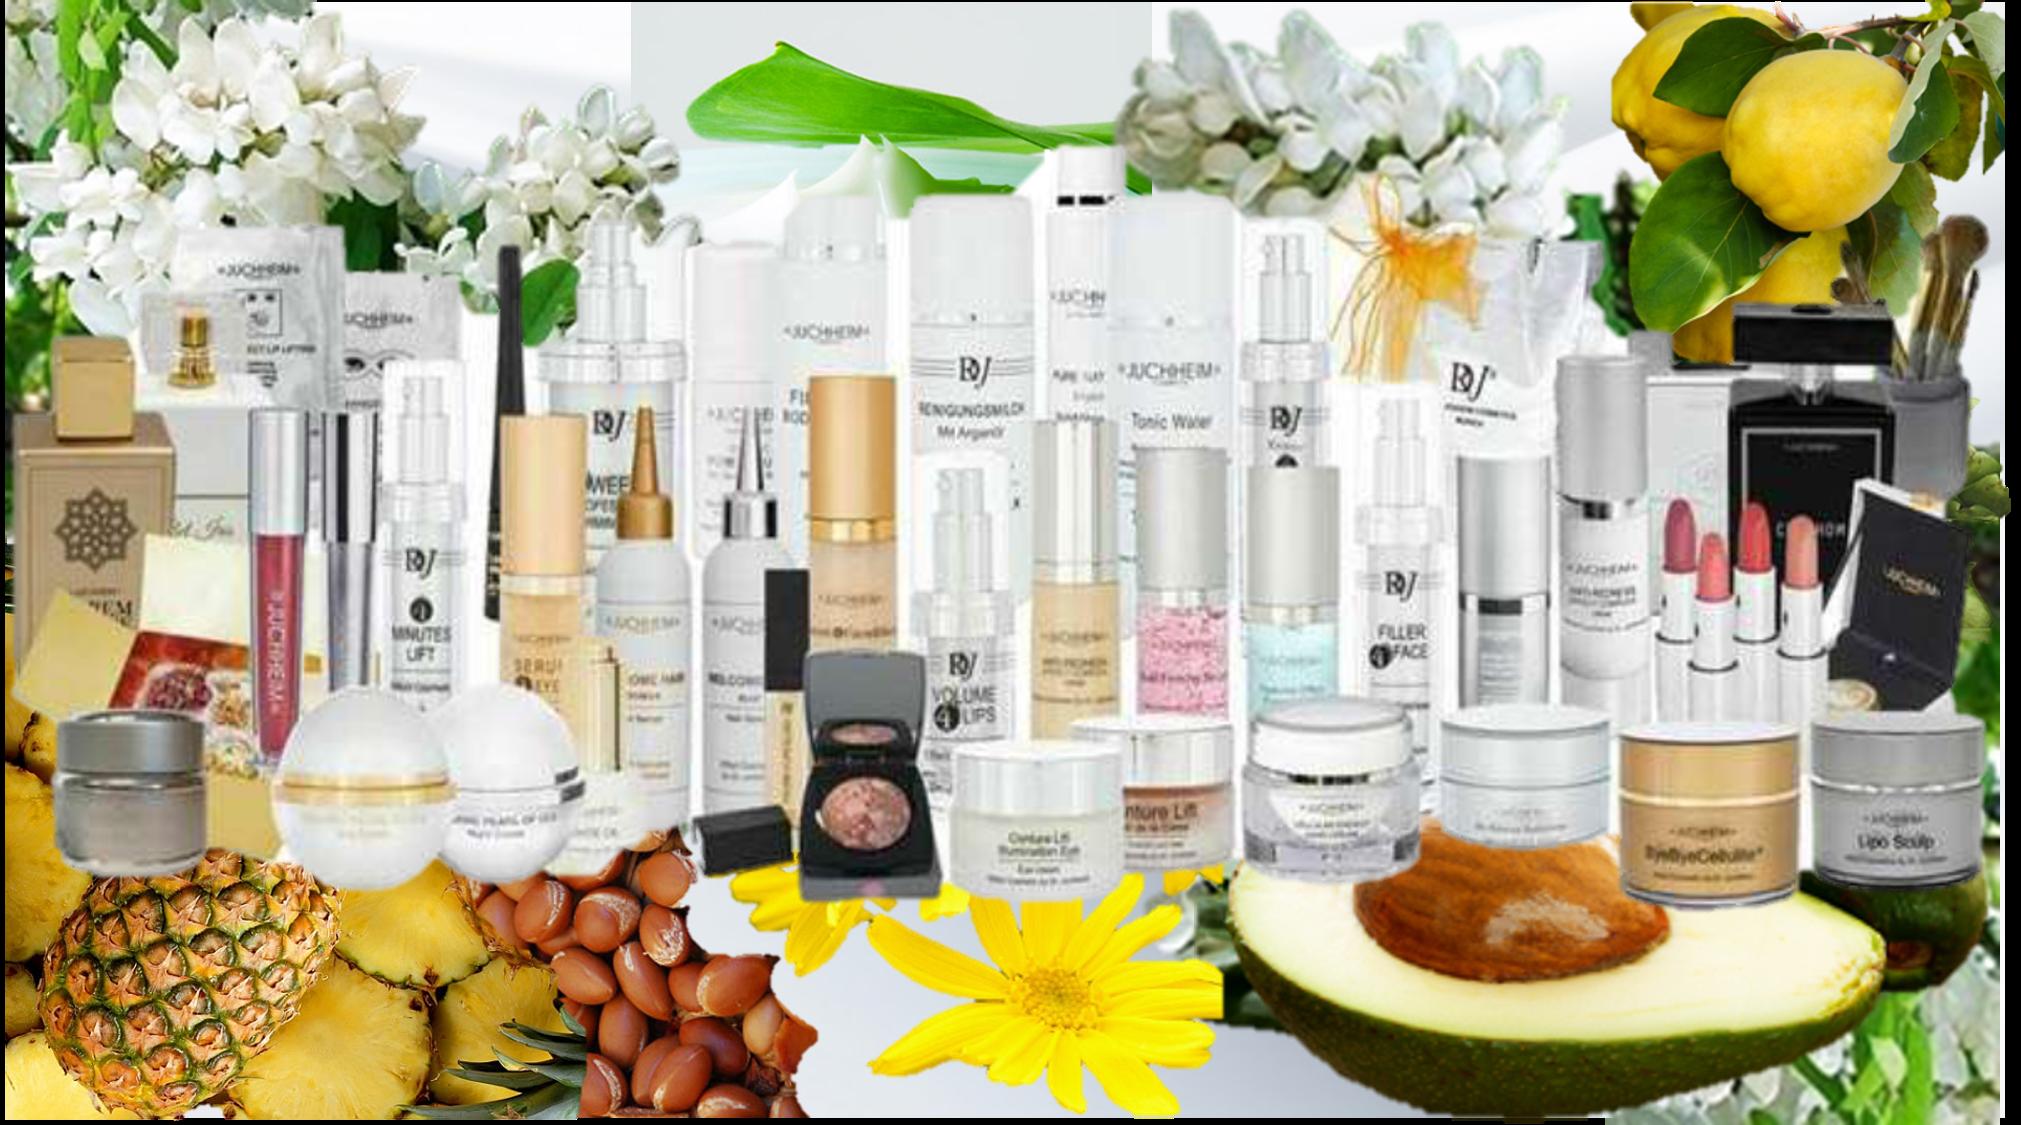 Naturalnaja Cosmetika